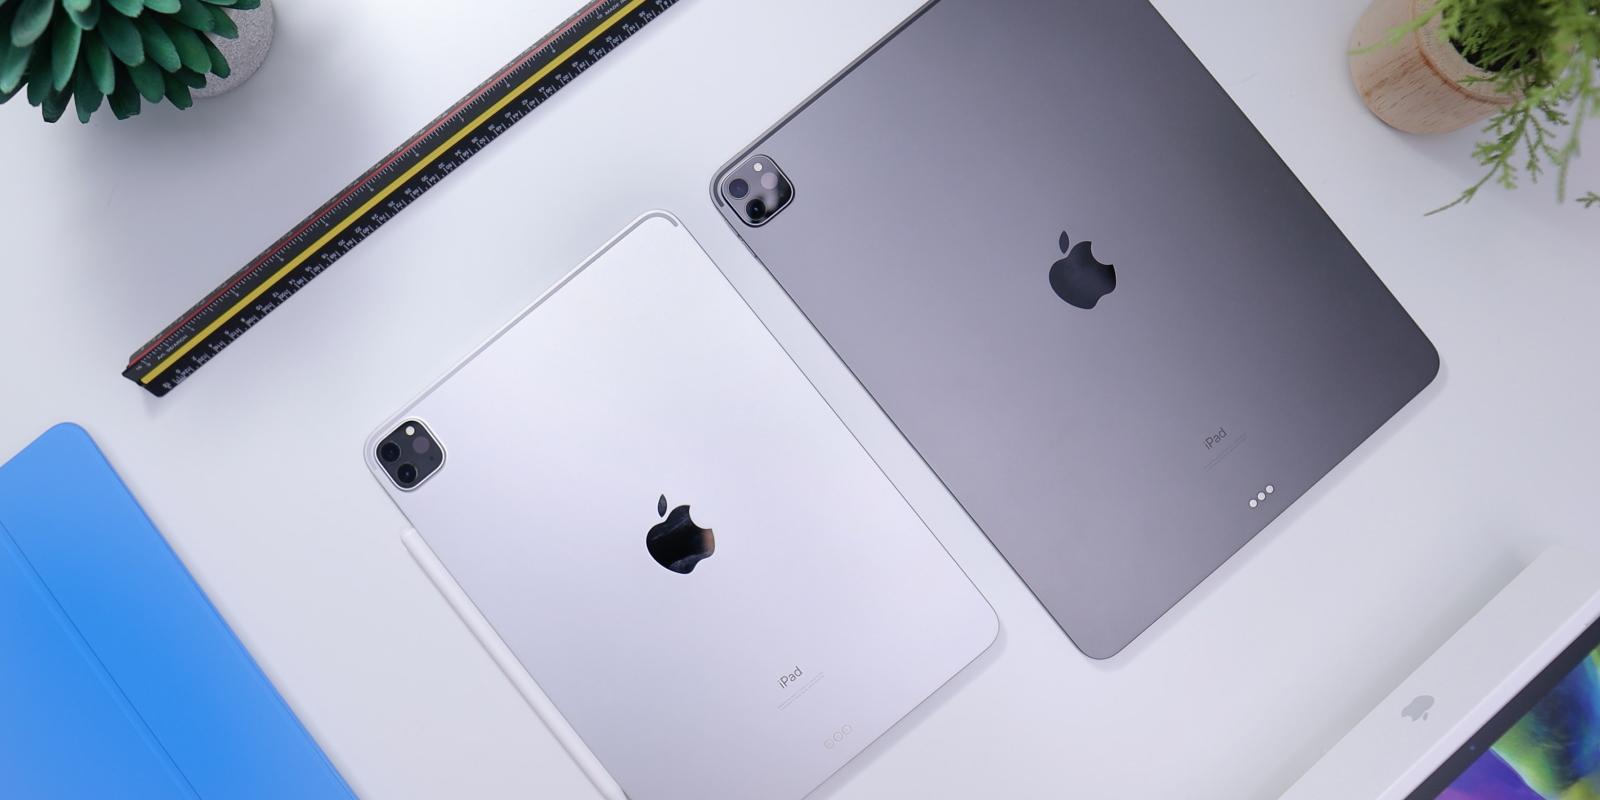 iPad Pro 2021 12.9 inch